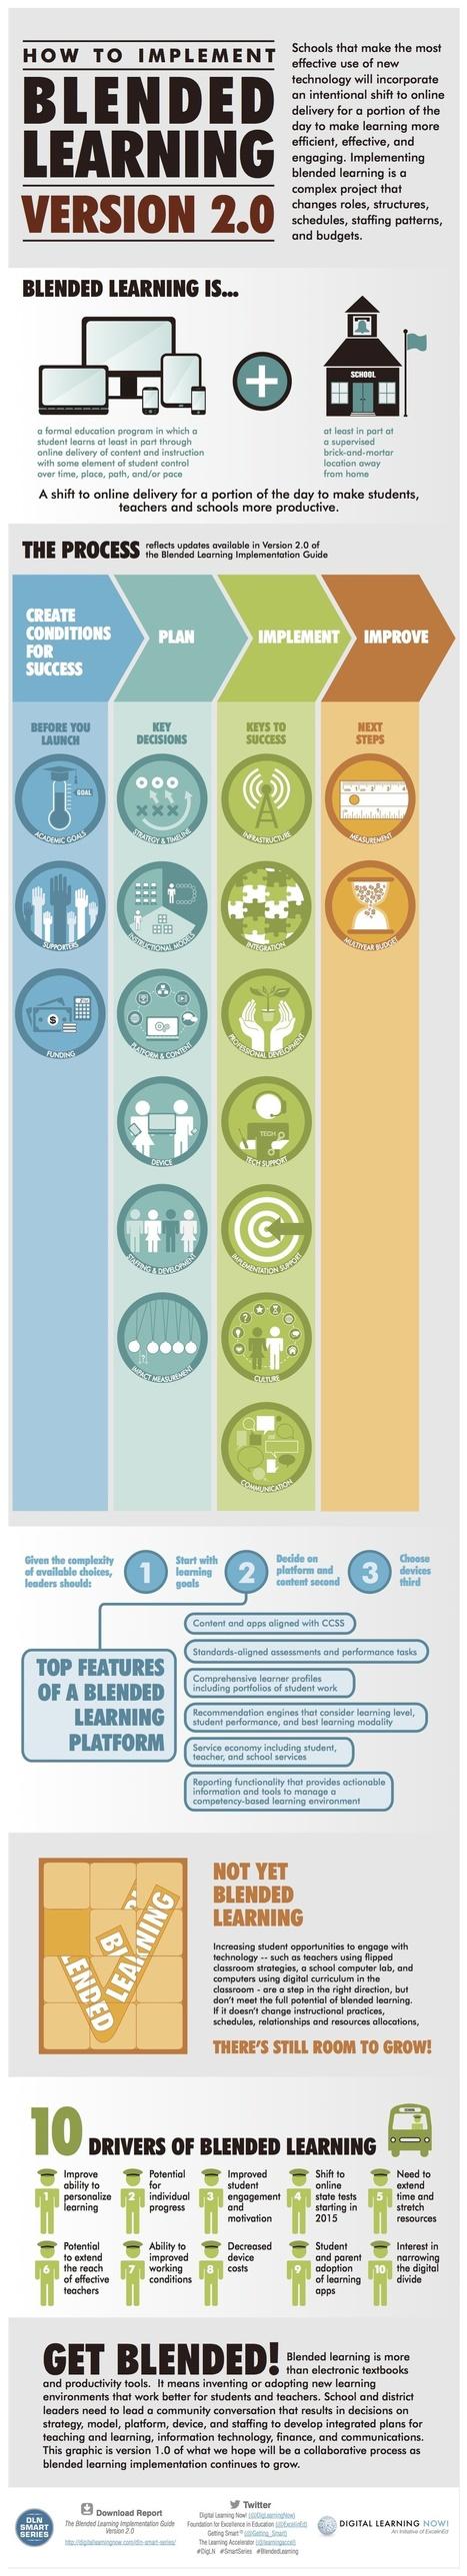 Blended Learning V2.0 Infographic | Professional Development | Scoop.it